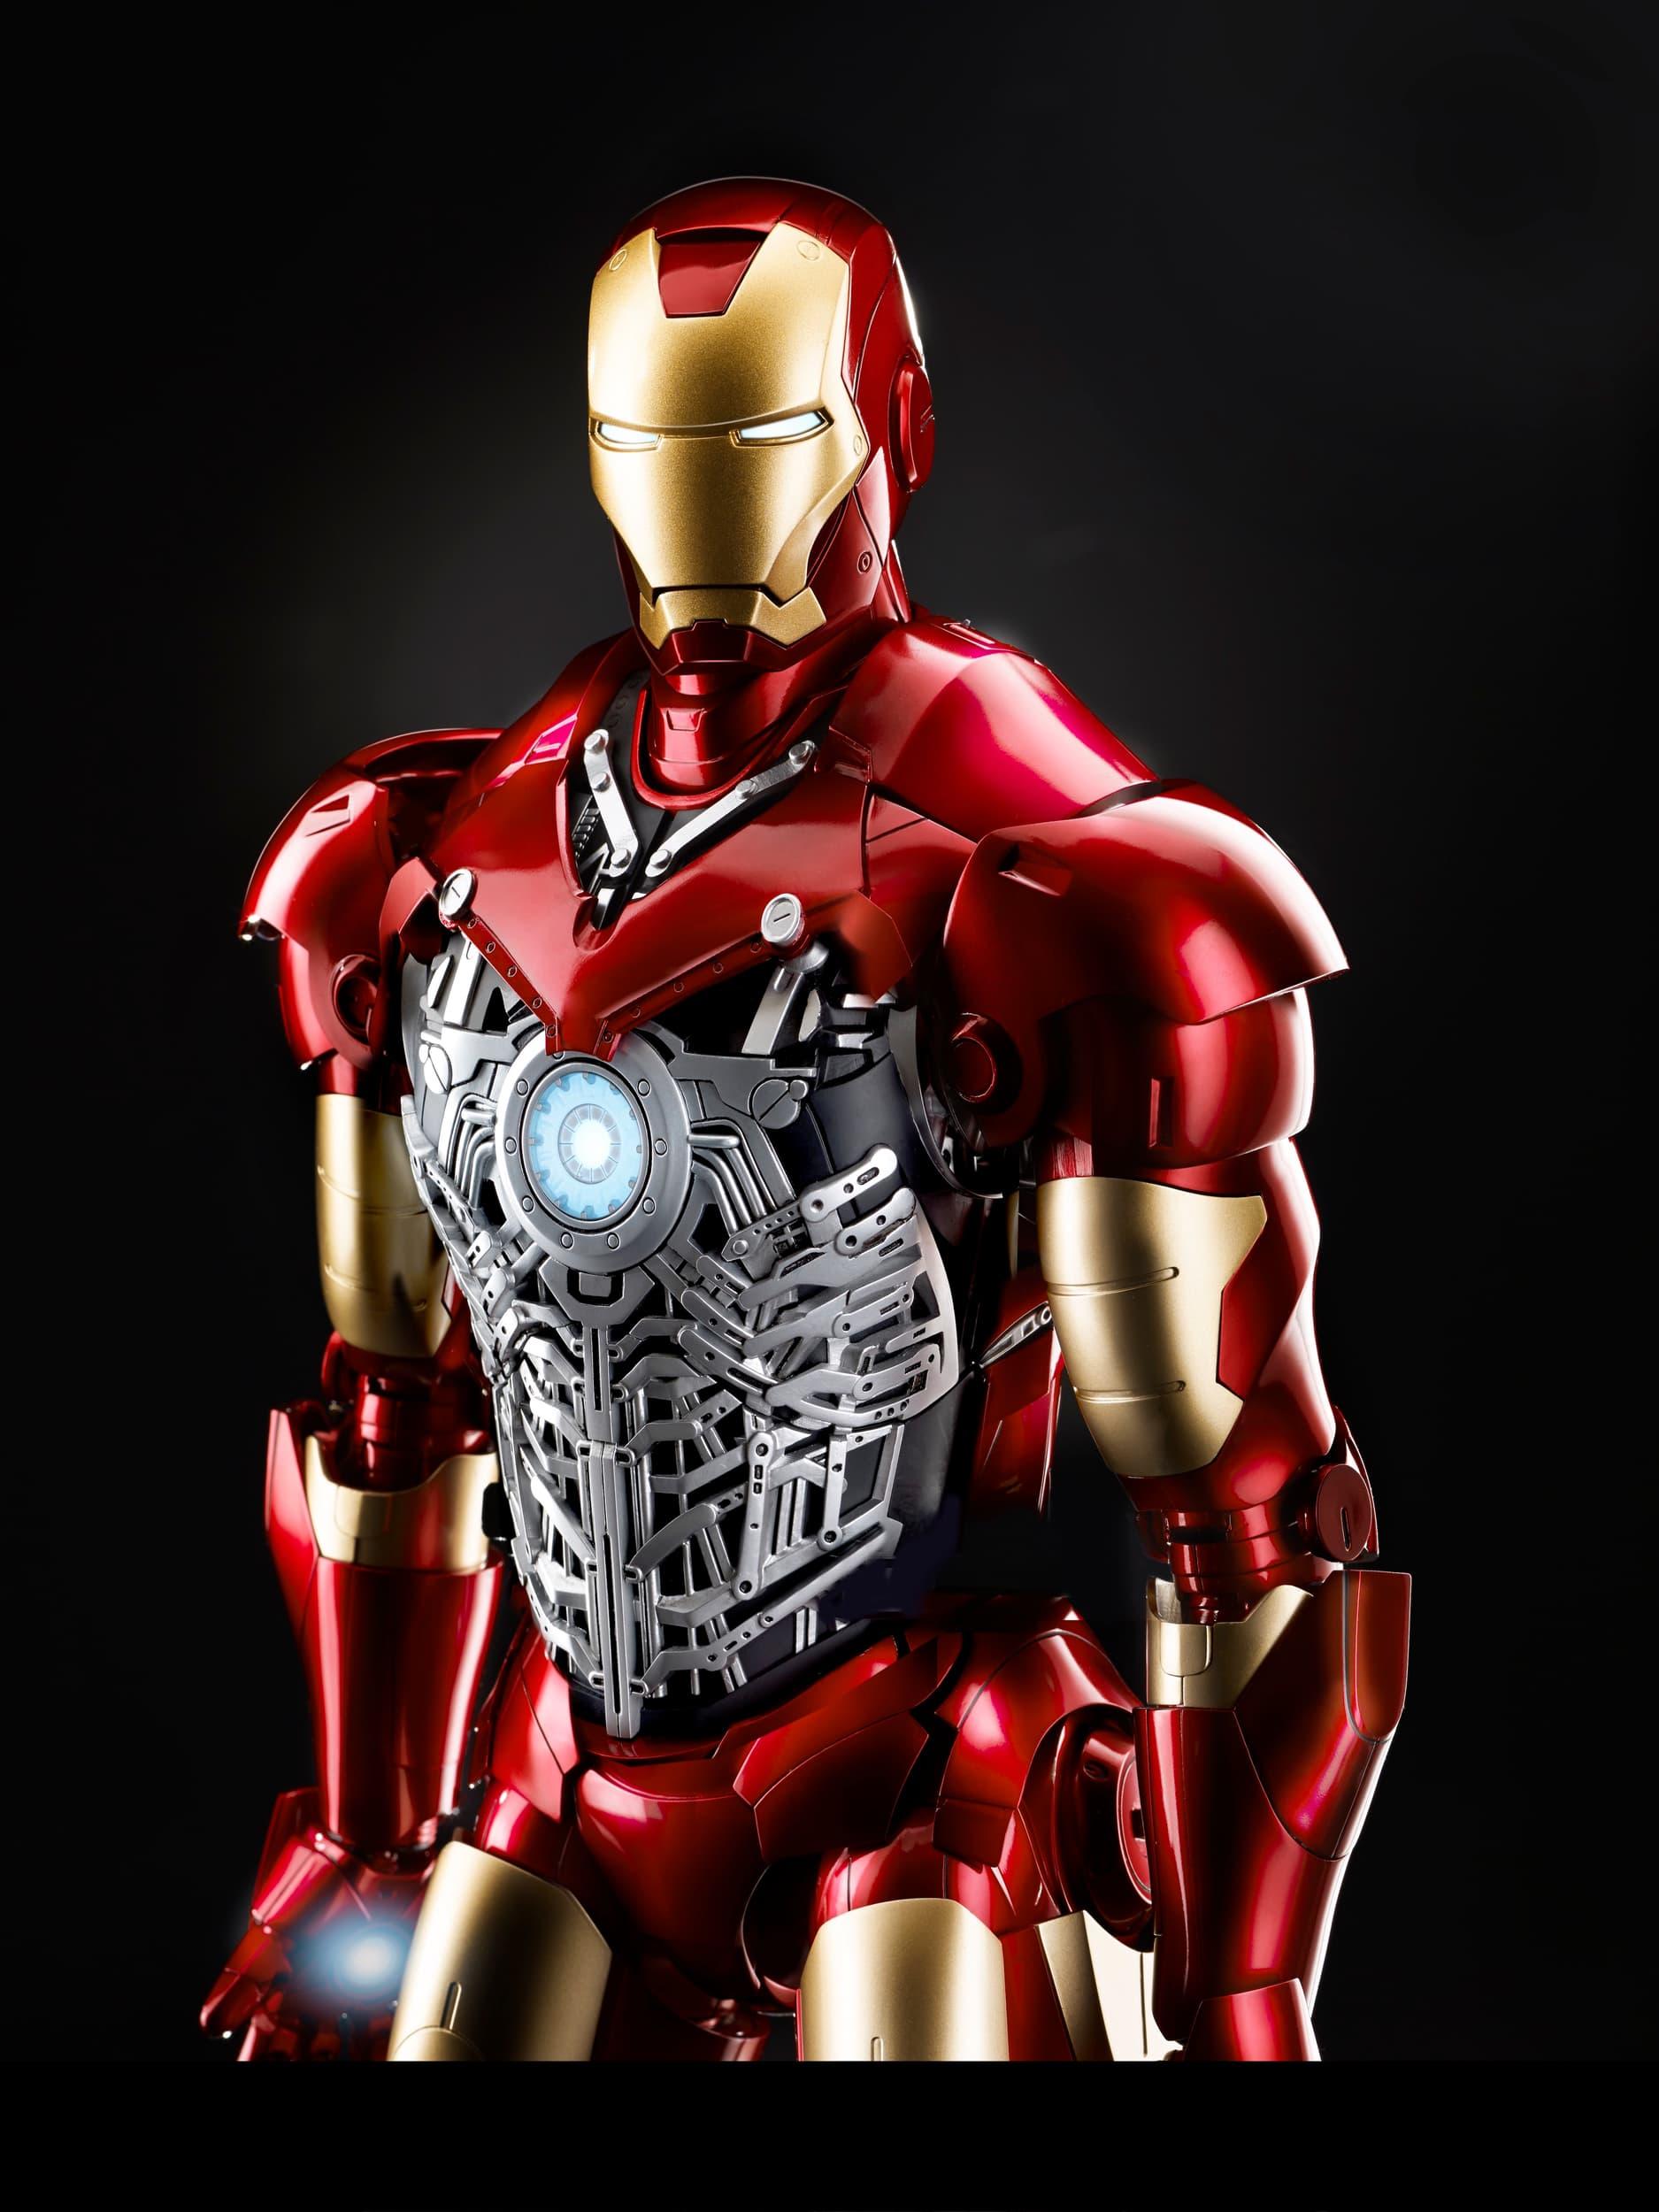 Marvel x Fanhome's Iron Man Mach III Armor